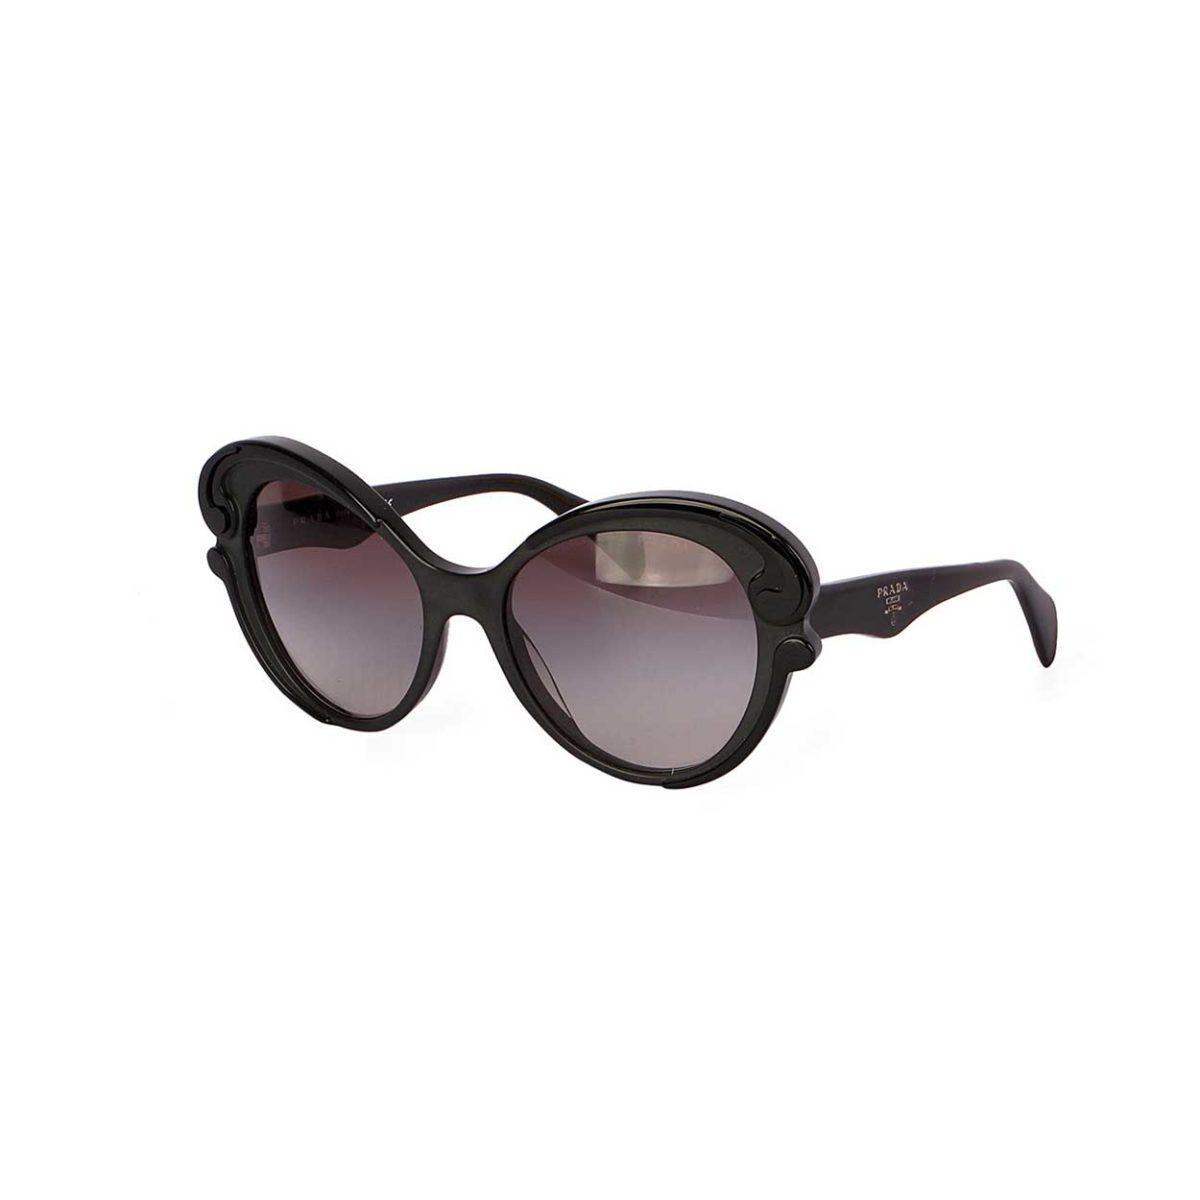 76426382fbd87 PRADA Havana Cat Eye Sunglasses Black Matte Resin SPR28N